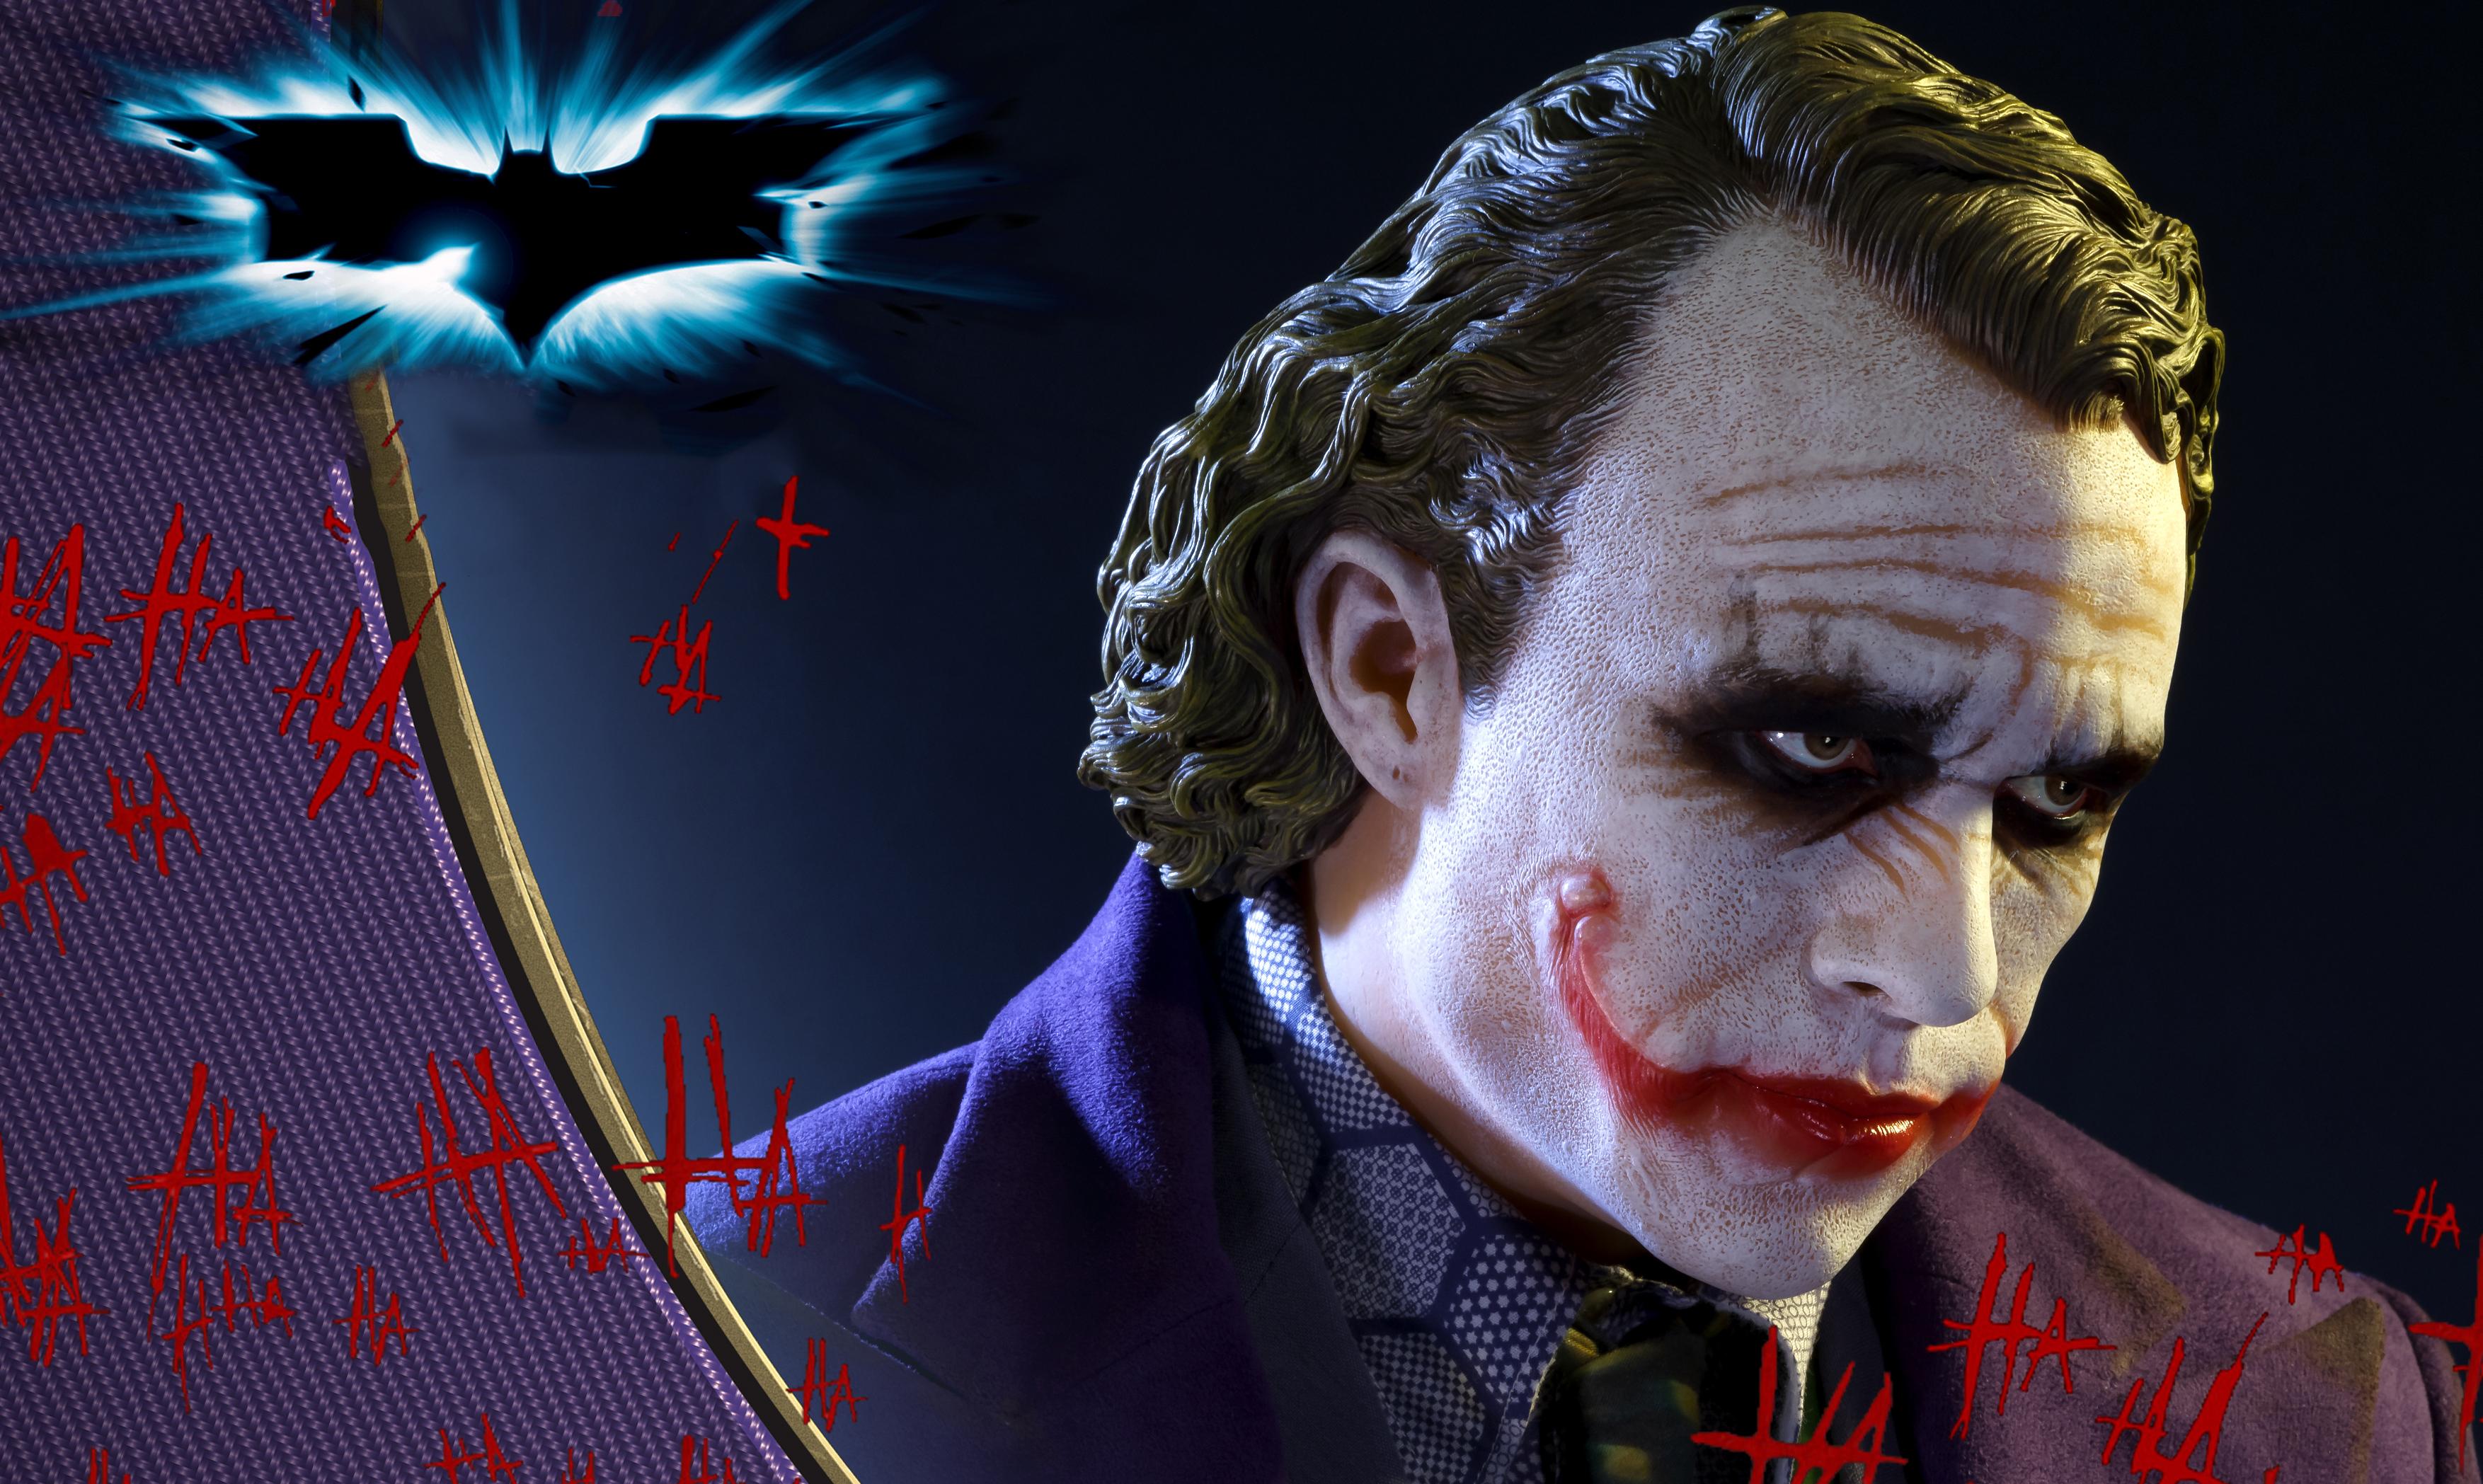 960x540 Joker In The Dark Knight 960x540 Resolution Hd 4k